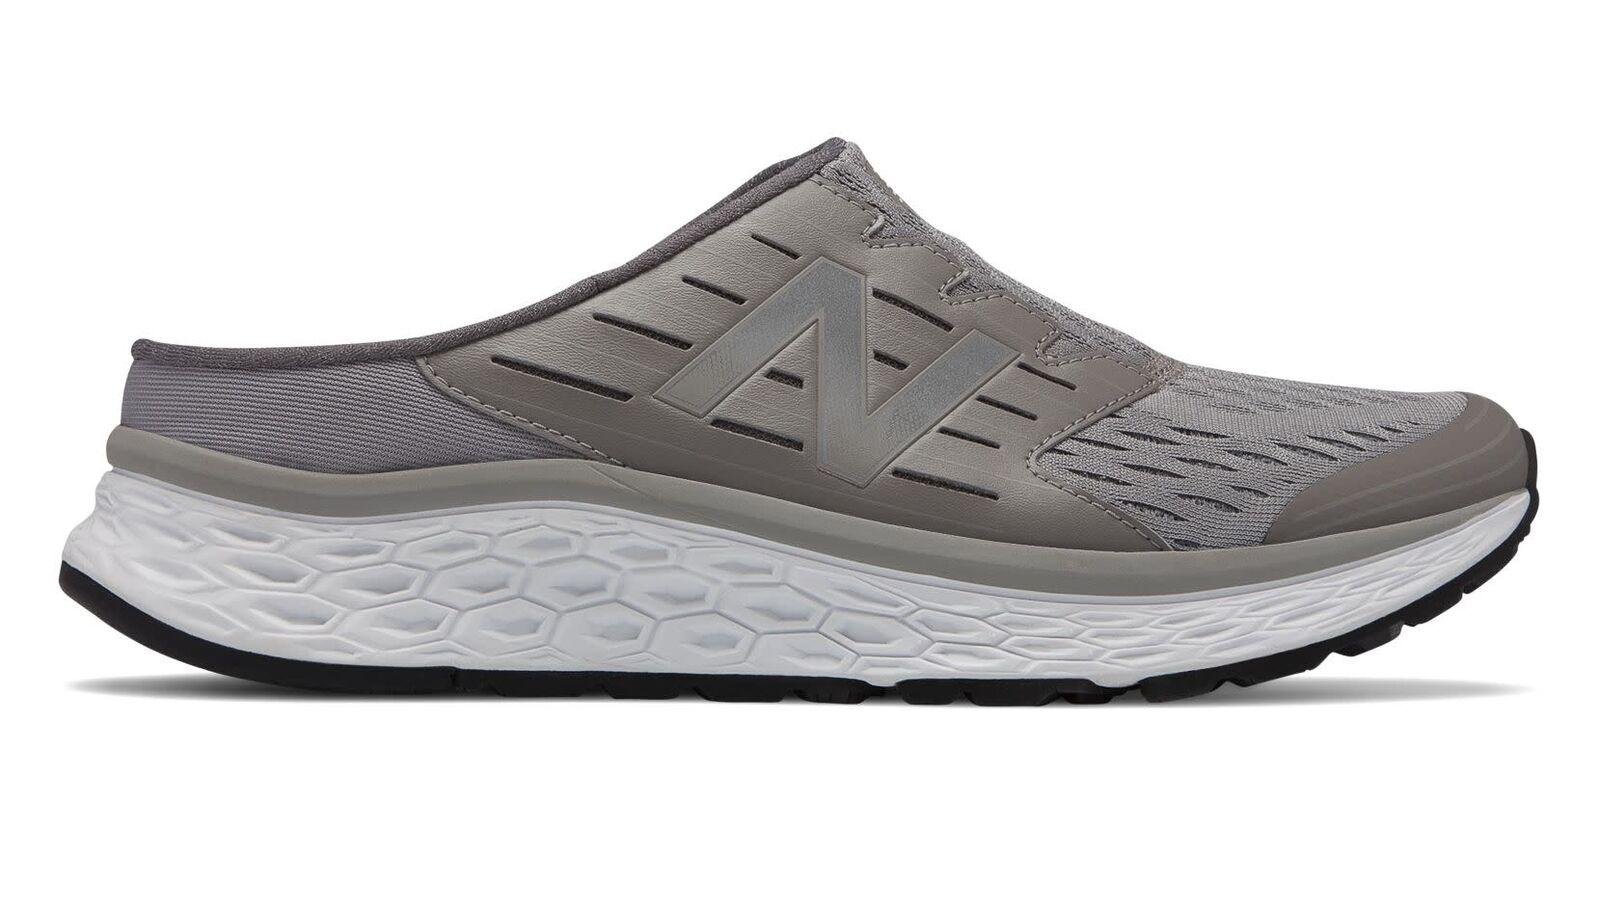 New Balance MA900GY 900v1 Fresh Foam Grey White Men's Walking shoes